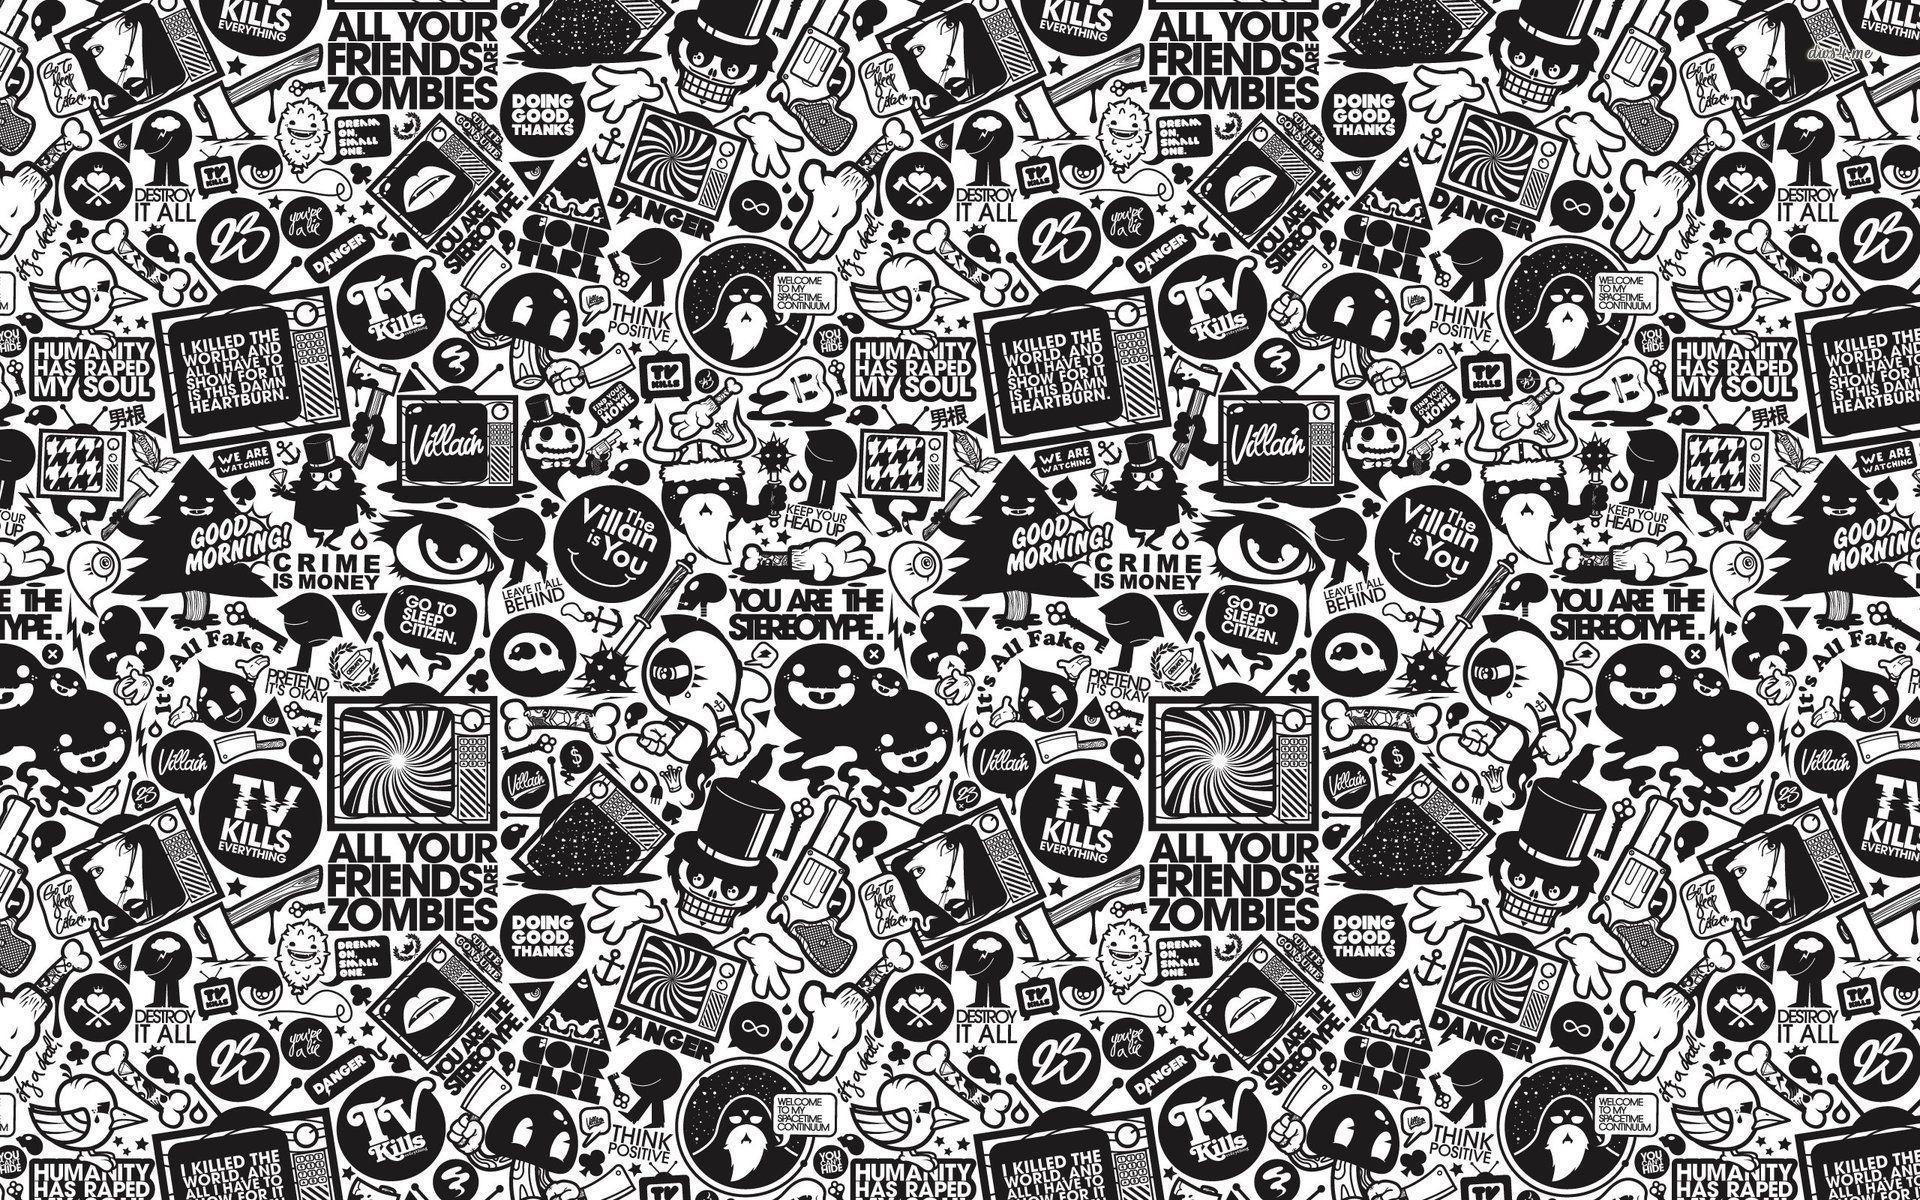 50 Best Free Tumblr Black And White Desktop Wallpapers